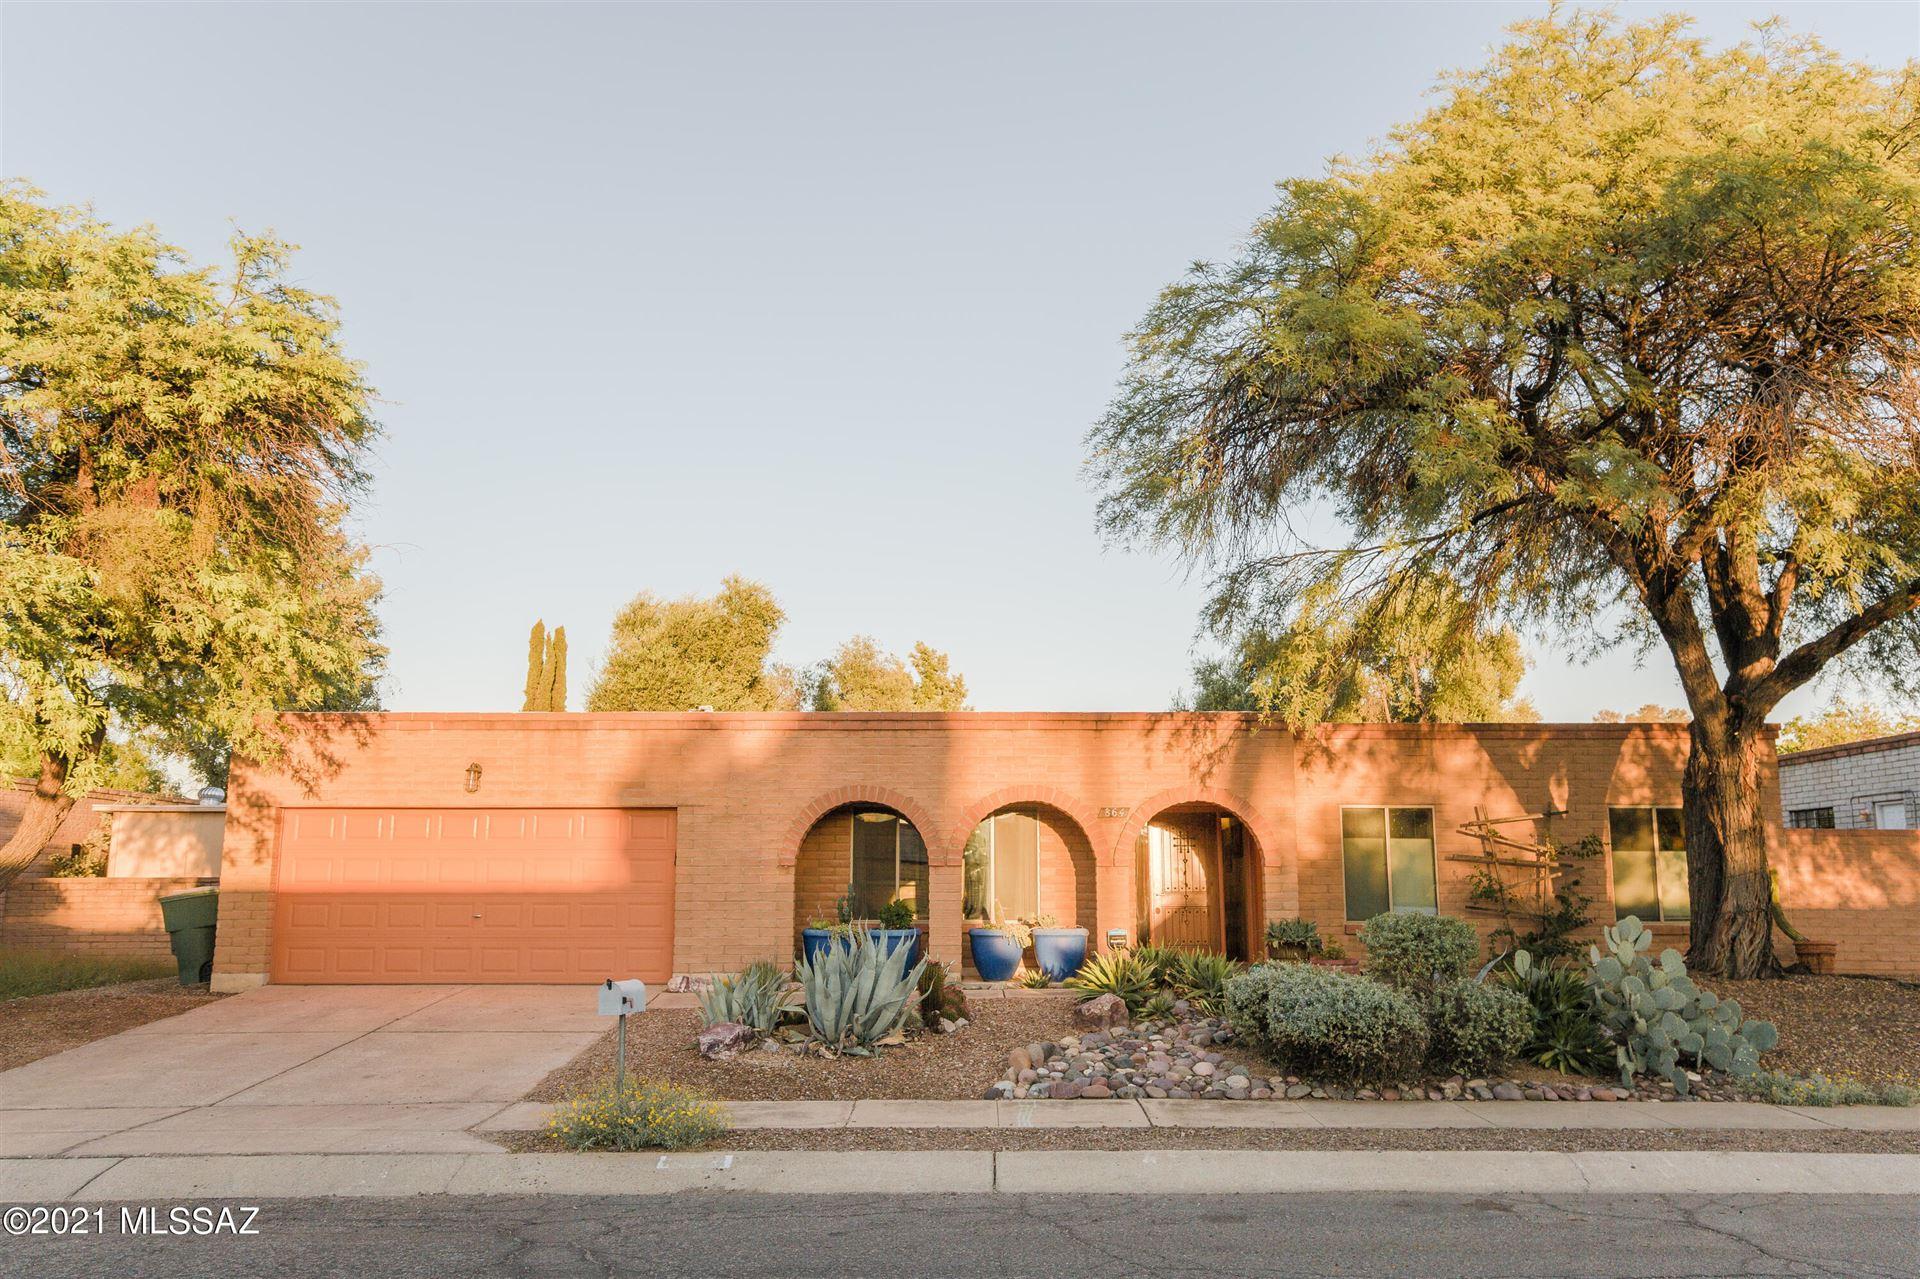 864 N Citadel Avenue, Tucson, AZ 85748 - MLS#: 22124600